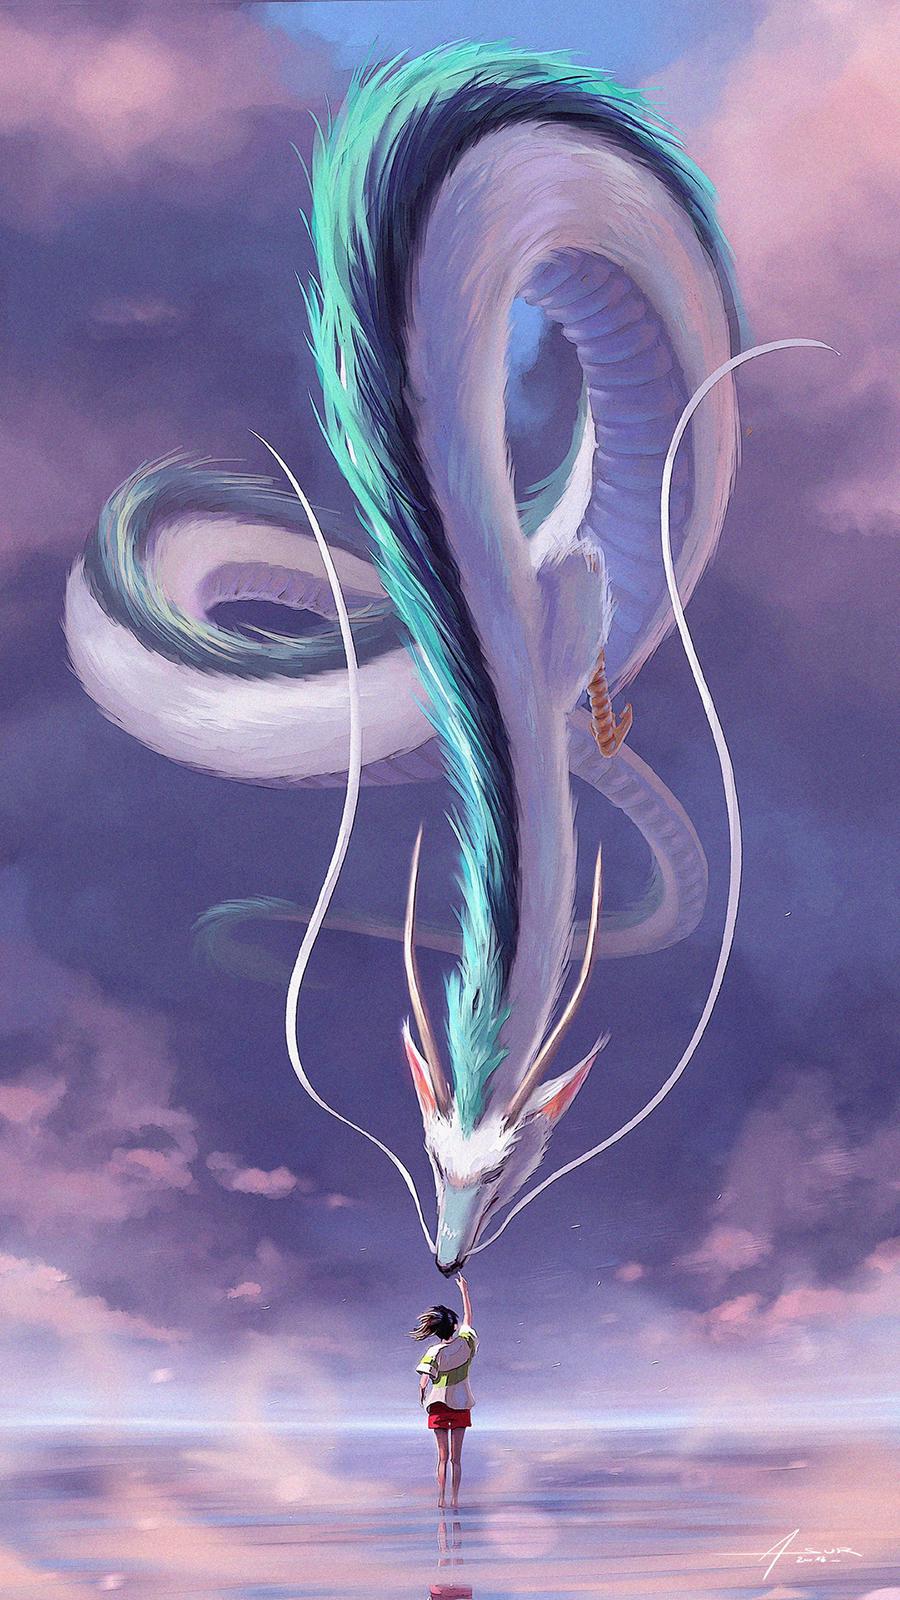 Cartoon Dragon Wallpapers Free Download